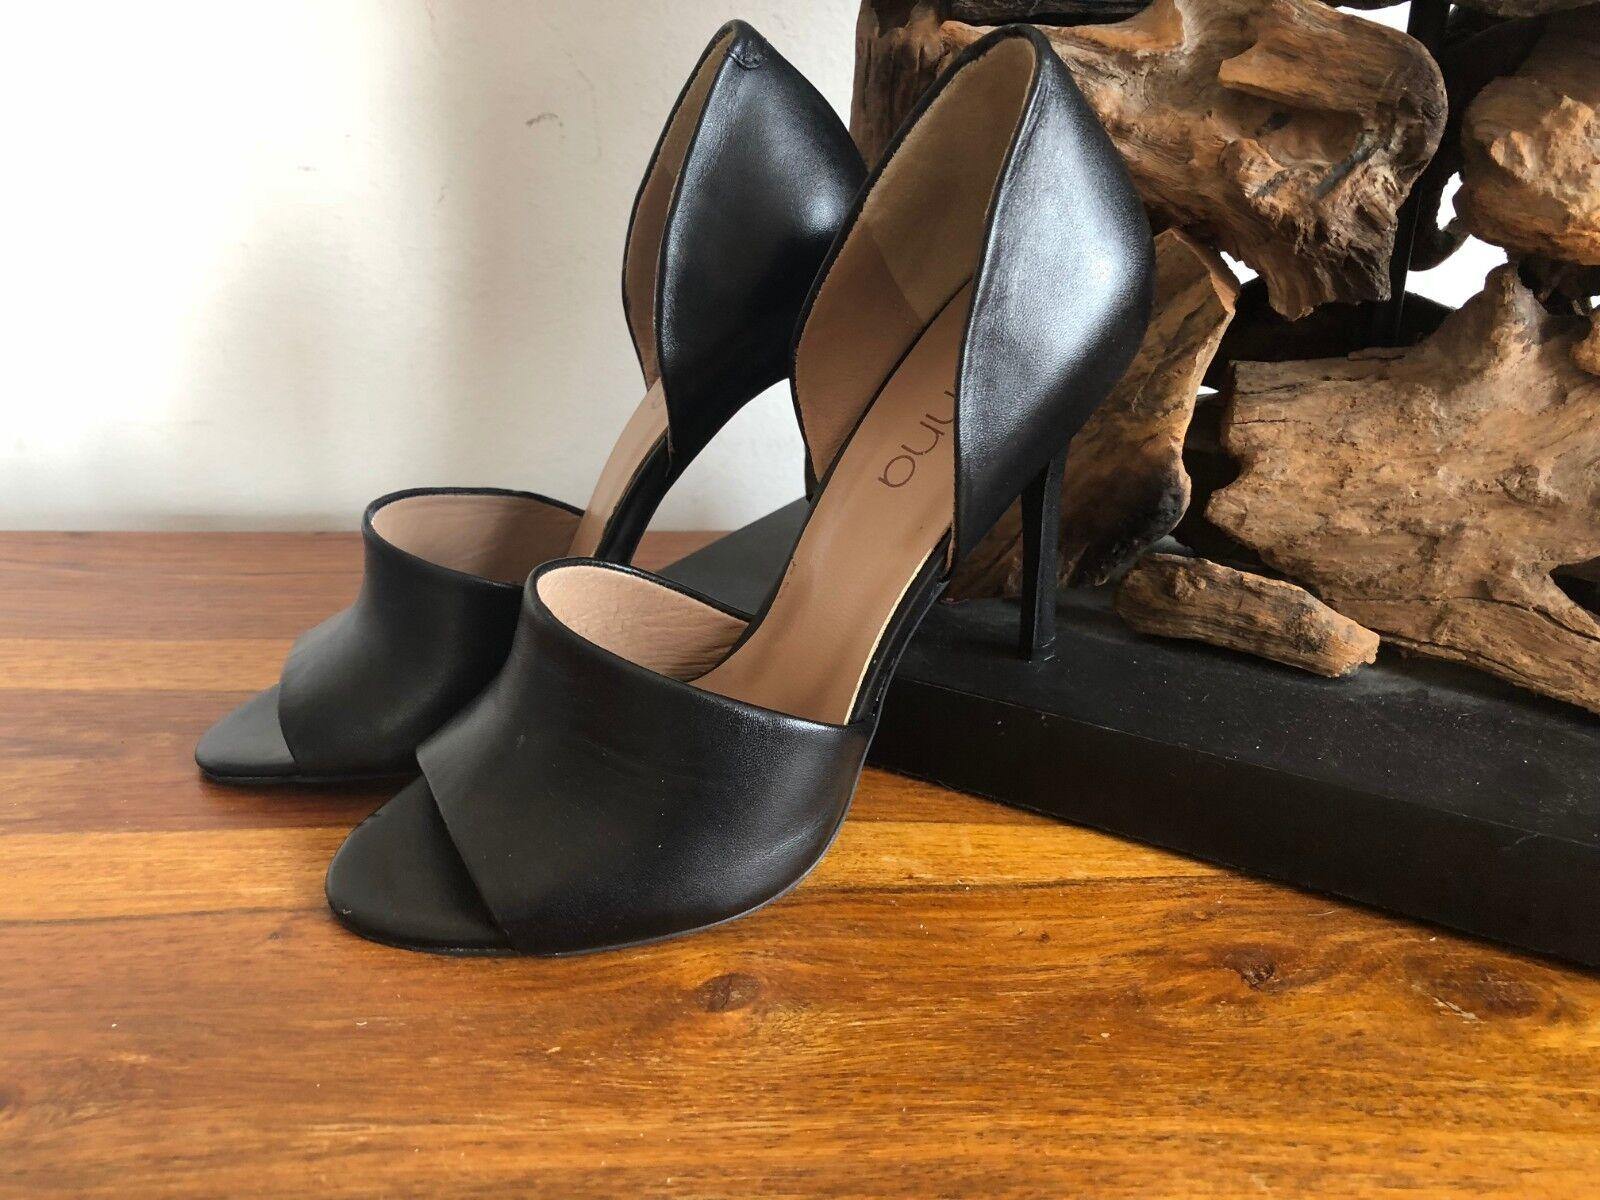 Sienna Sandalette NEU Sandale Leder schwarz Peeptoe High Heels NEU Sandalette Gr 38 SU51s 2ef081